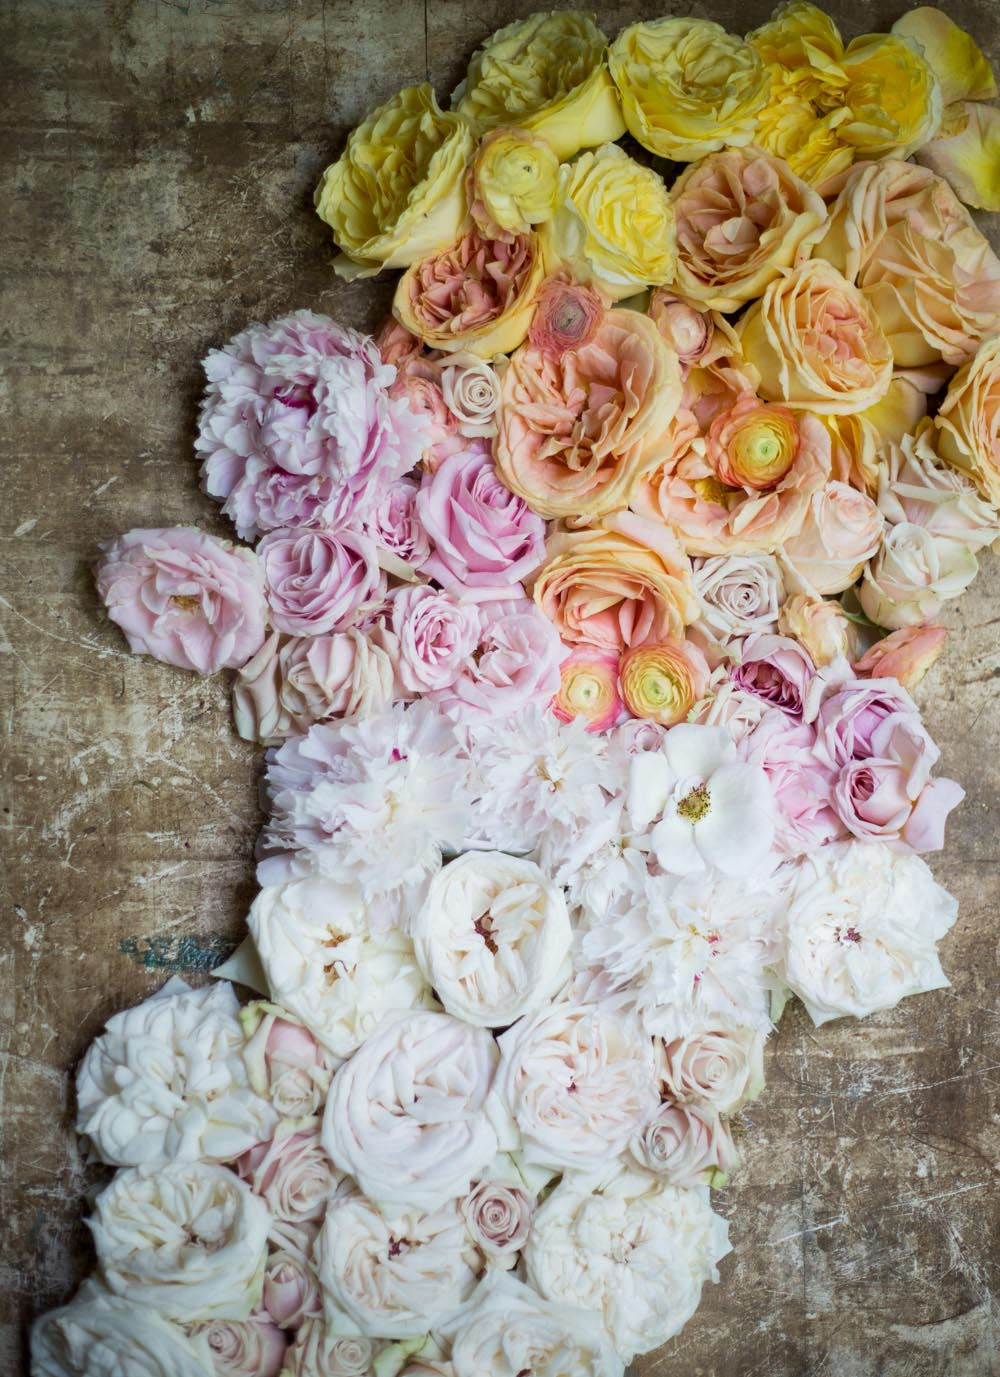 ombre_roses-9255.jpg